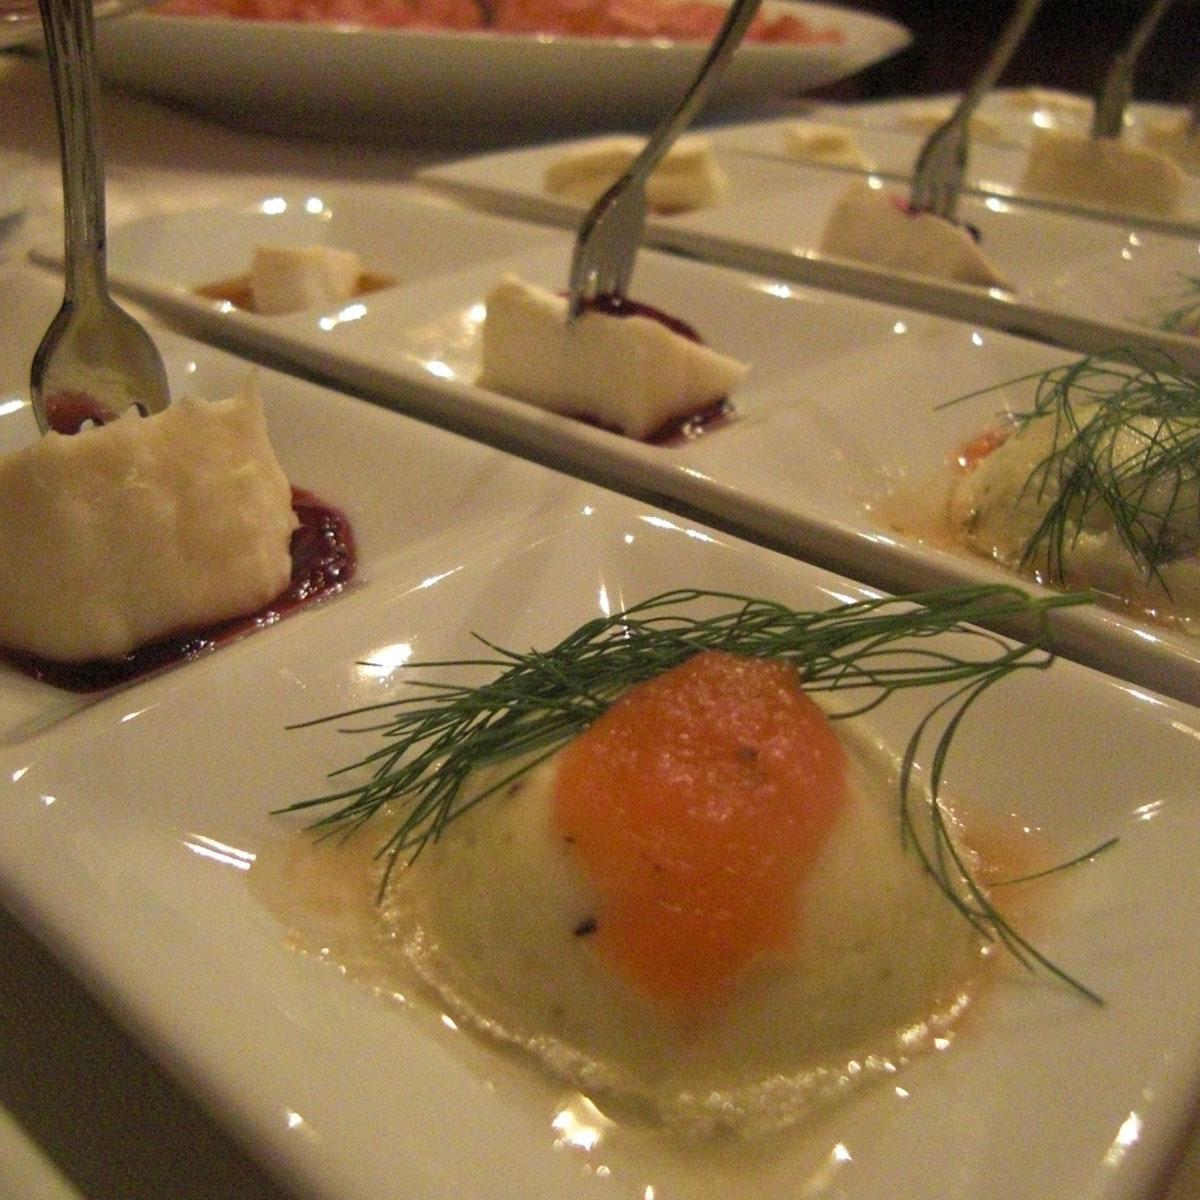 Cucina professionale | Negriricevimenti.com